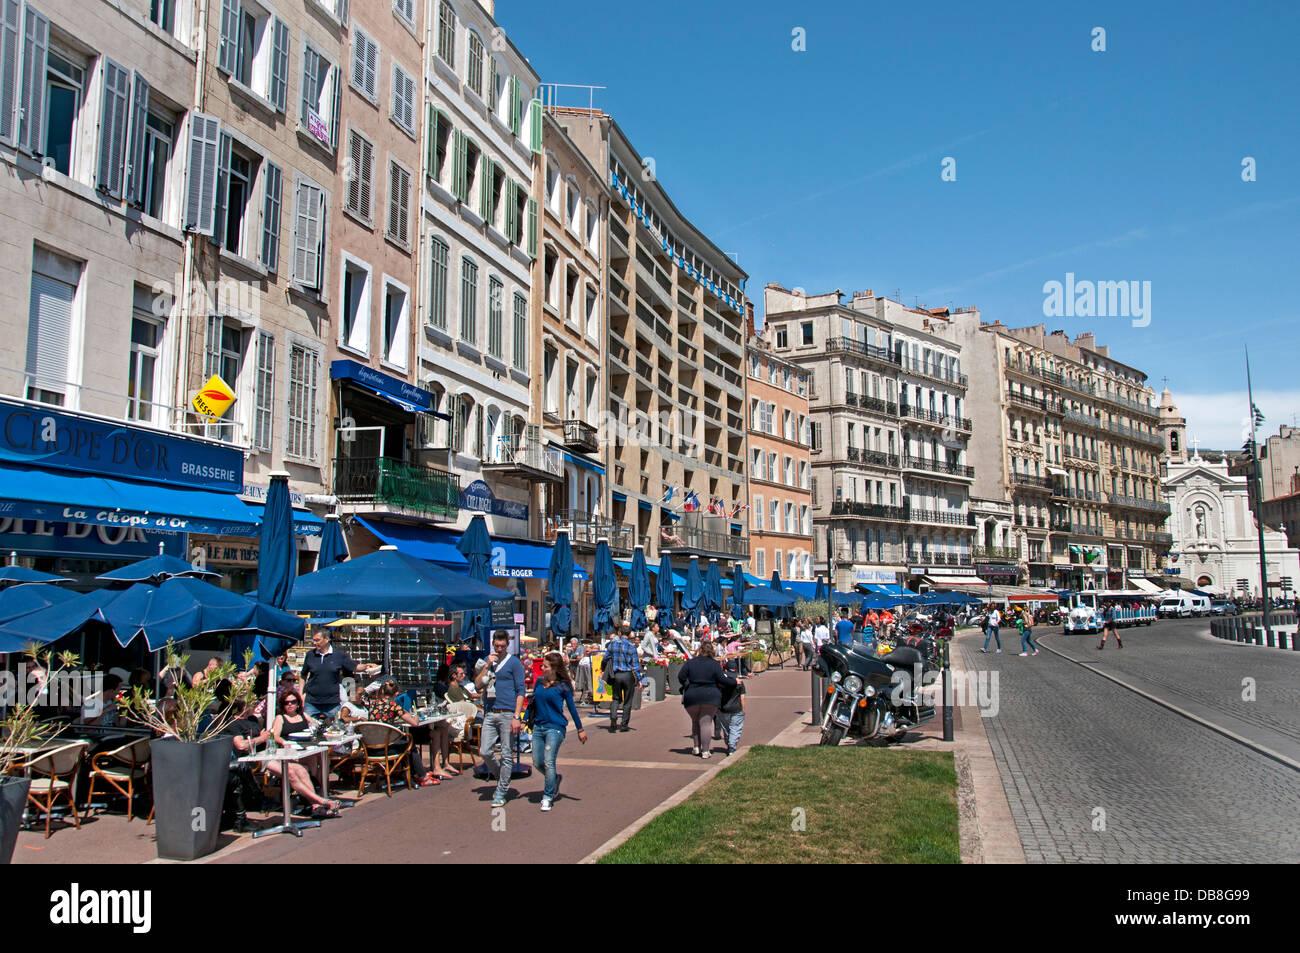 quai du port restaurant cafe bar pub marseilles vieux port stock photo royalty free